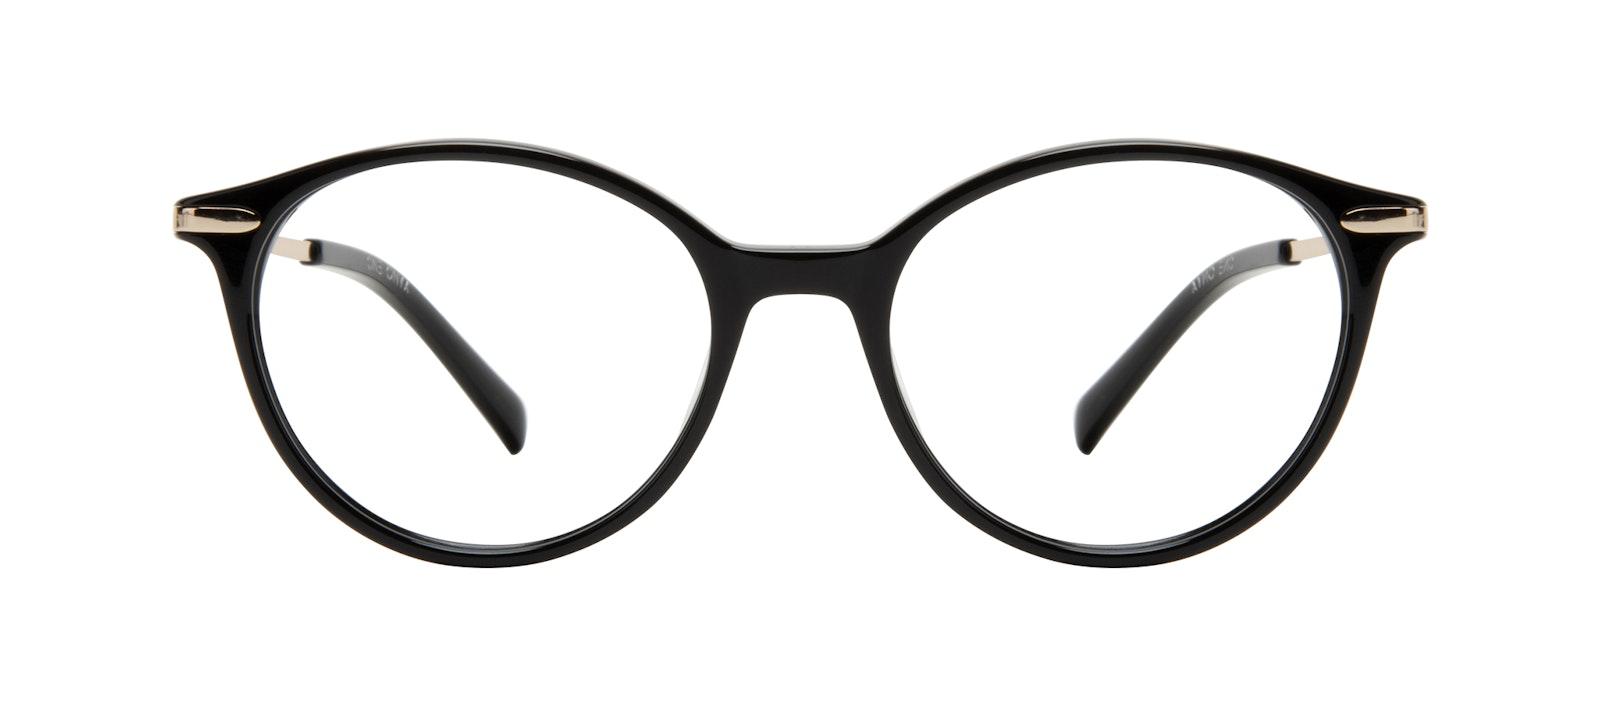 Affordable Fashion Glasses Round Eyeglasses Women One Onyx Front